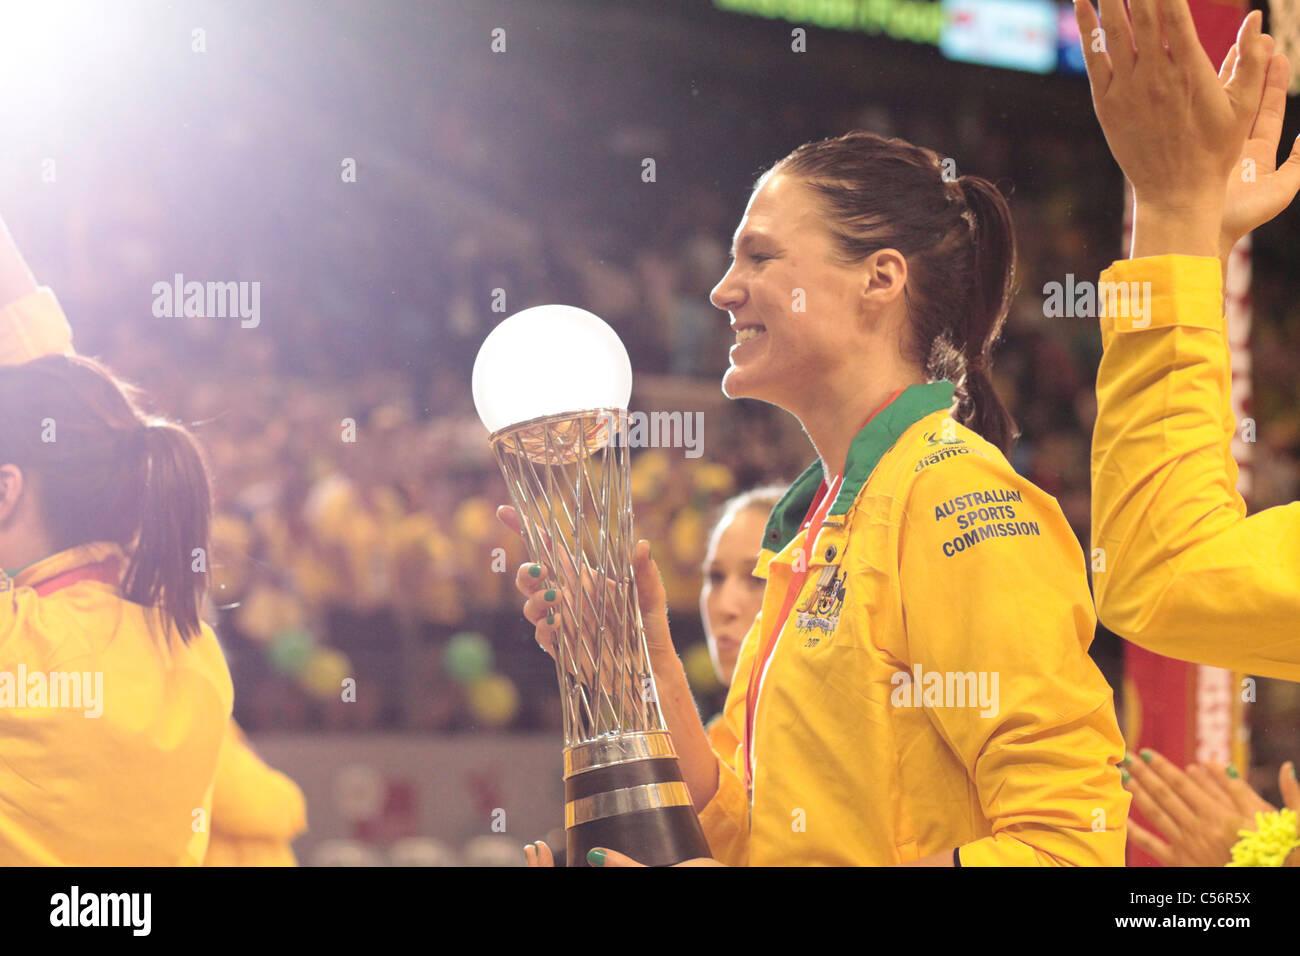 10.07.2011 Caitlin Bassett de Australia celebra el Campeonato Mundial de Baloncesto trofeo, Mission Foods campeonatos Imagen De Stock